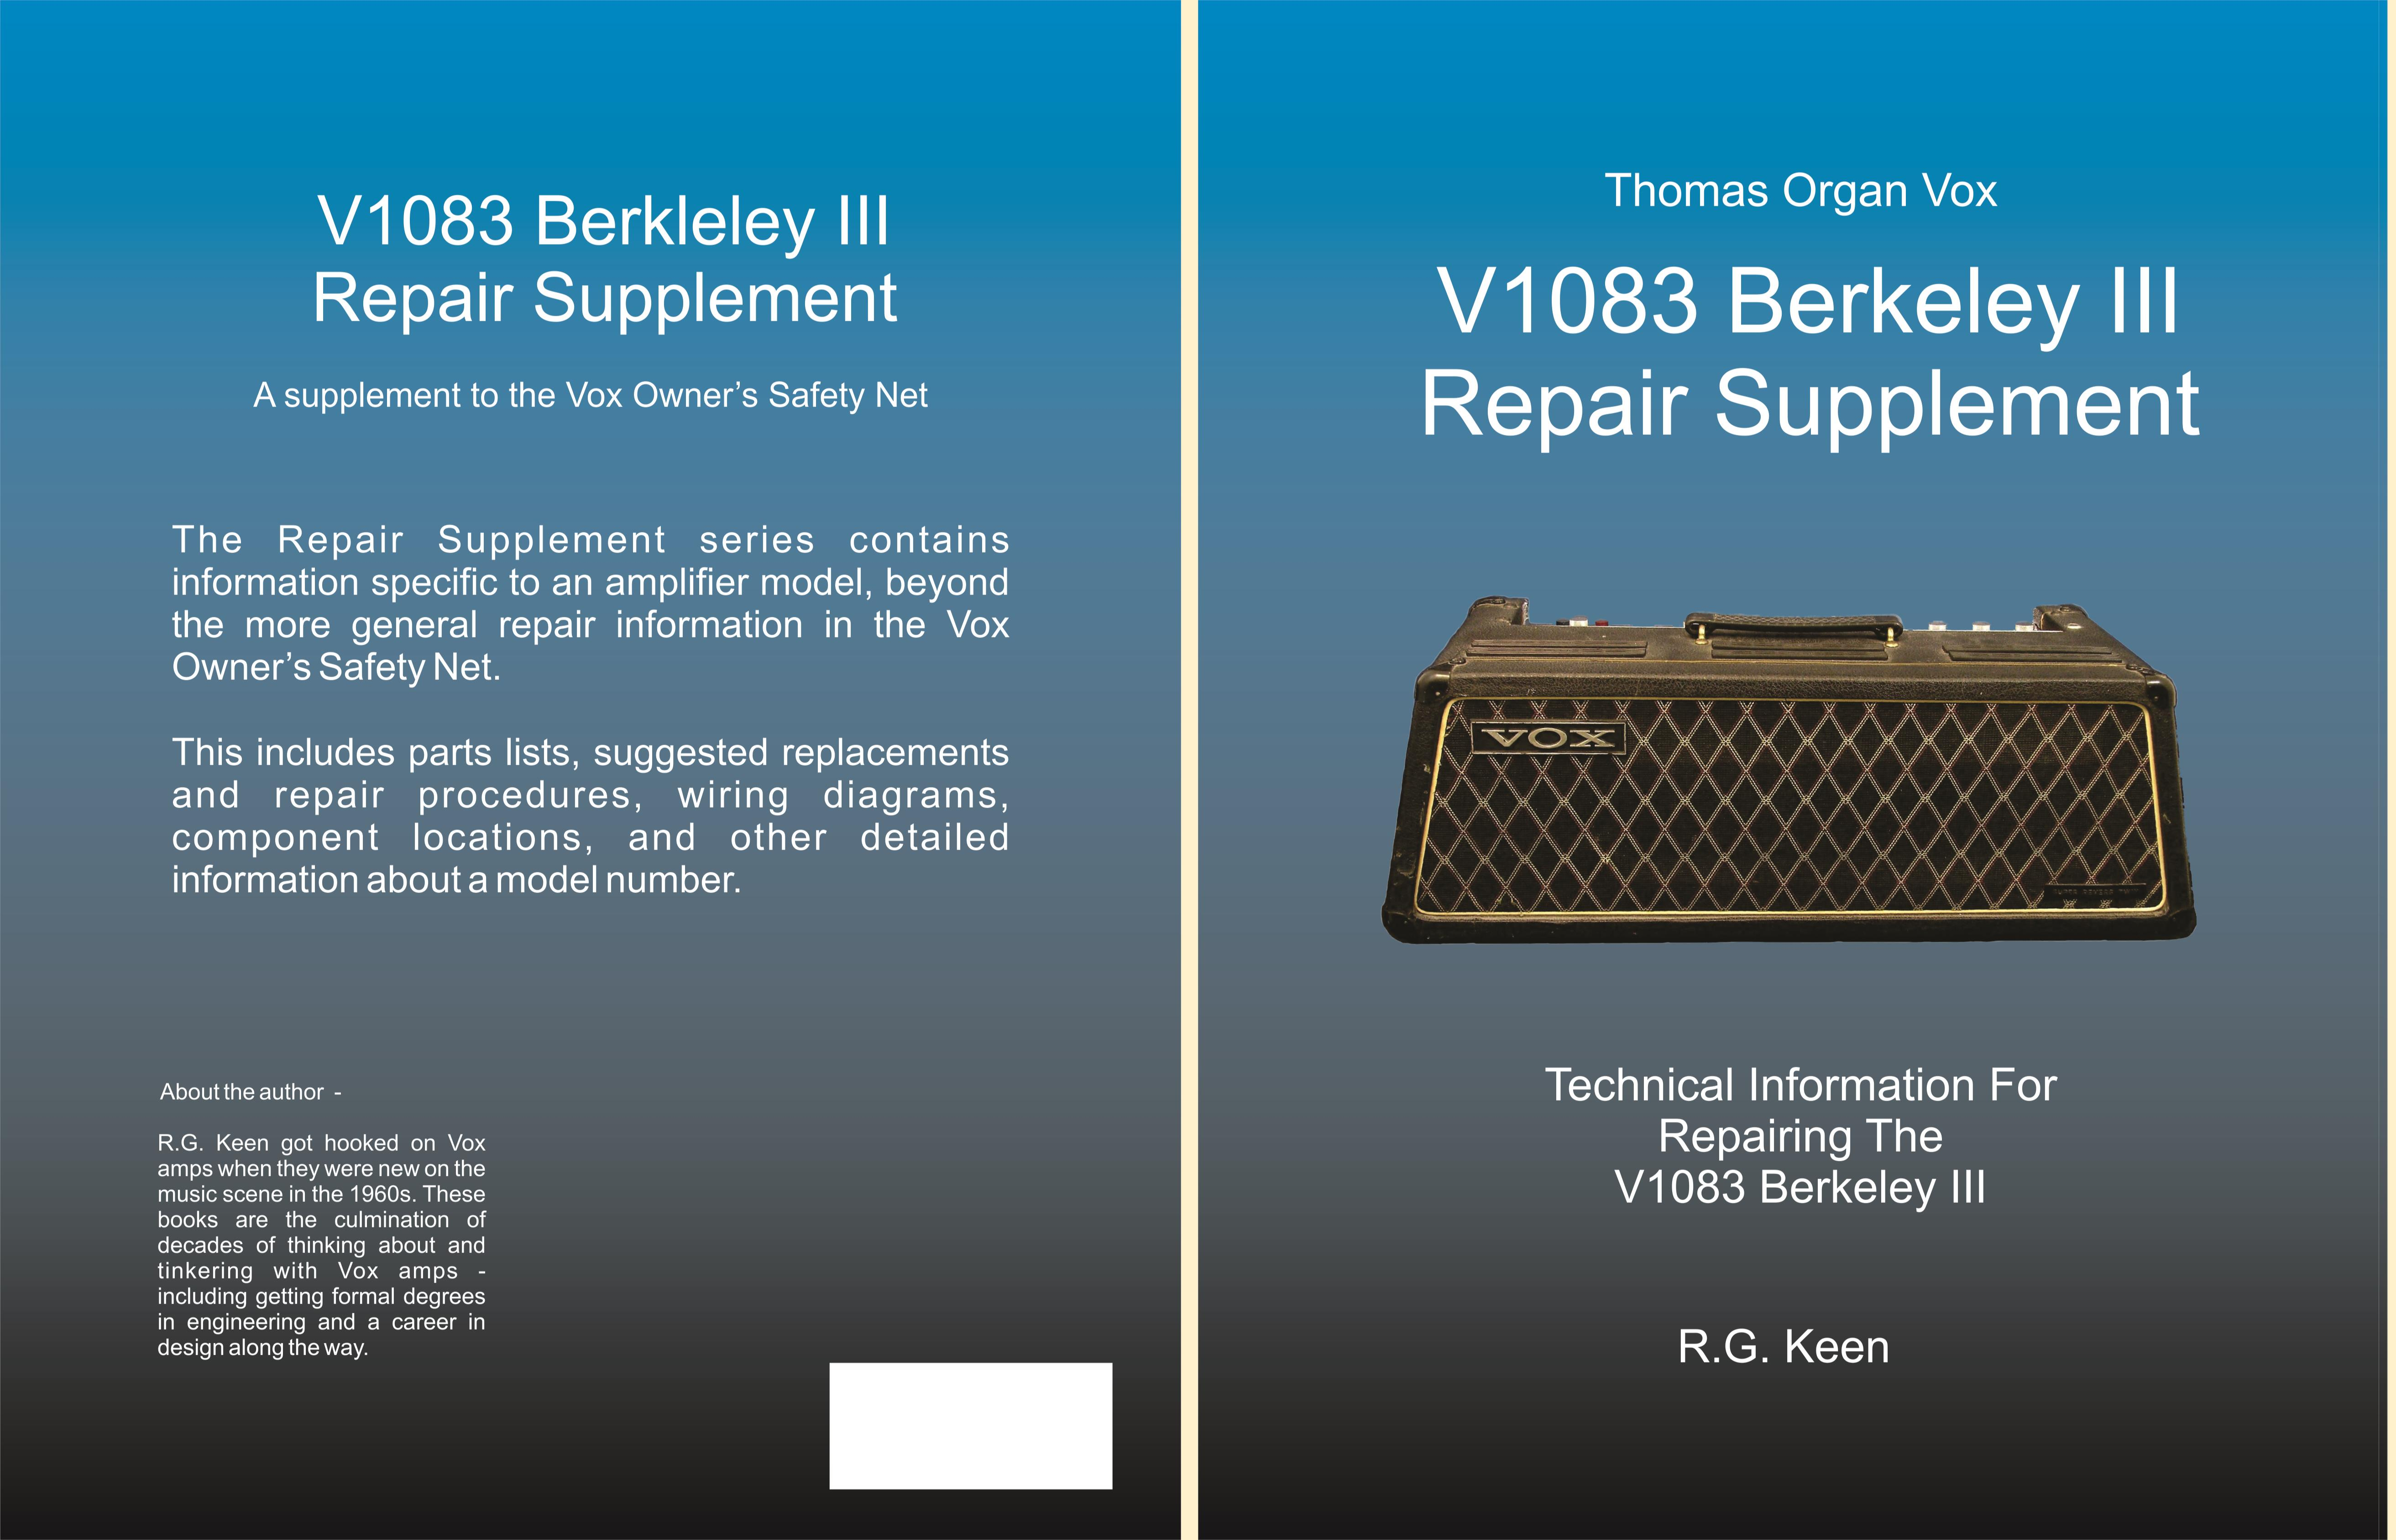 V1083 Berkeley Iii Repair Supplement By Rg Keen 1865 Thomas Wiring Diagrams Cover Image